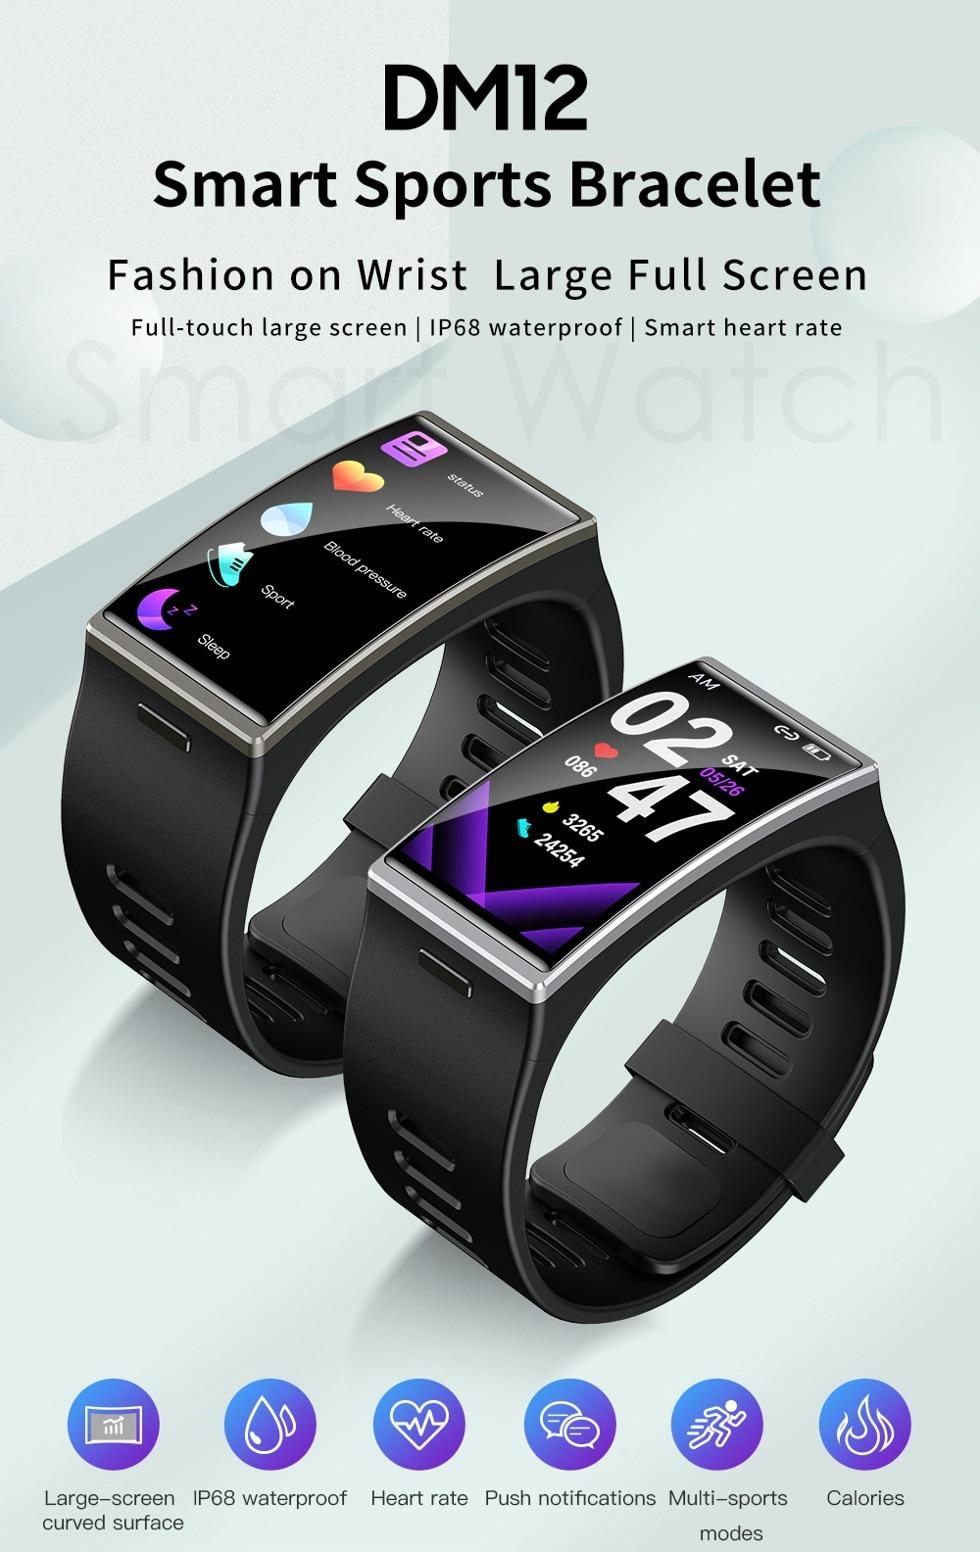 H522e7562ef044ea6aefa9de7bfc69efdJ Smartwatch 2020 1.9 Inch 170*320 Screen LEMFO DM12 Smart Watch Men IP68 Waterproof Sport Heart Rate Blood Pressure Android IOS